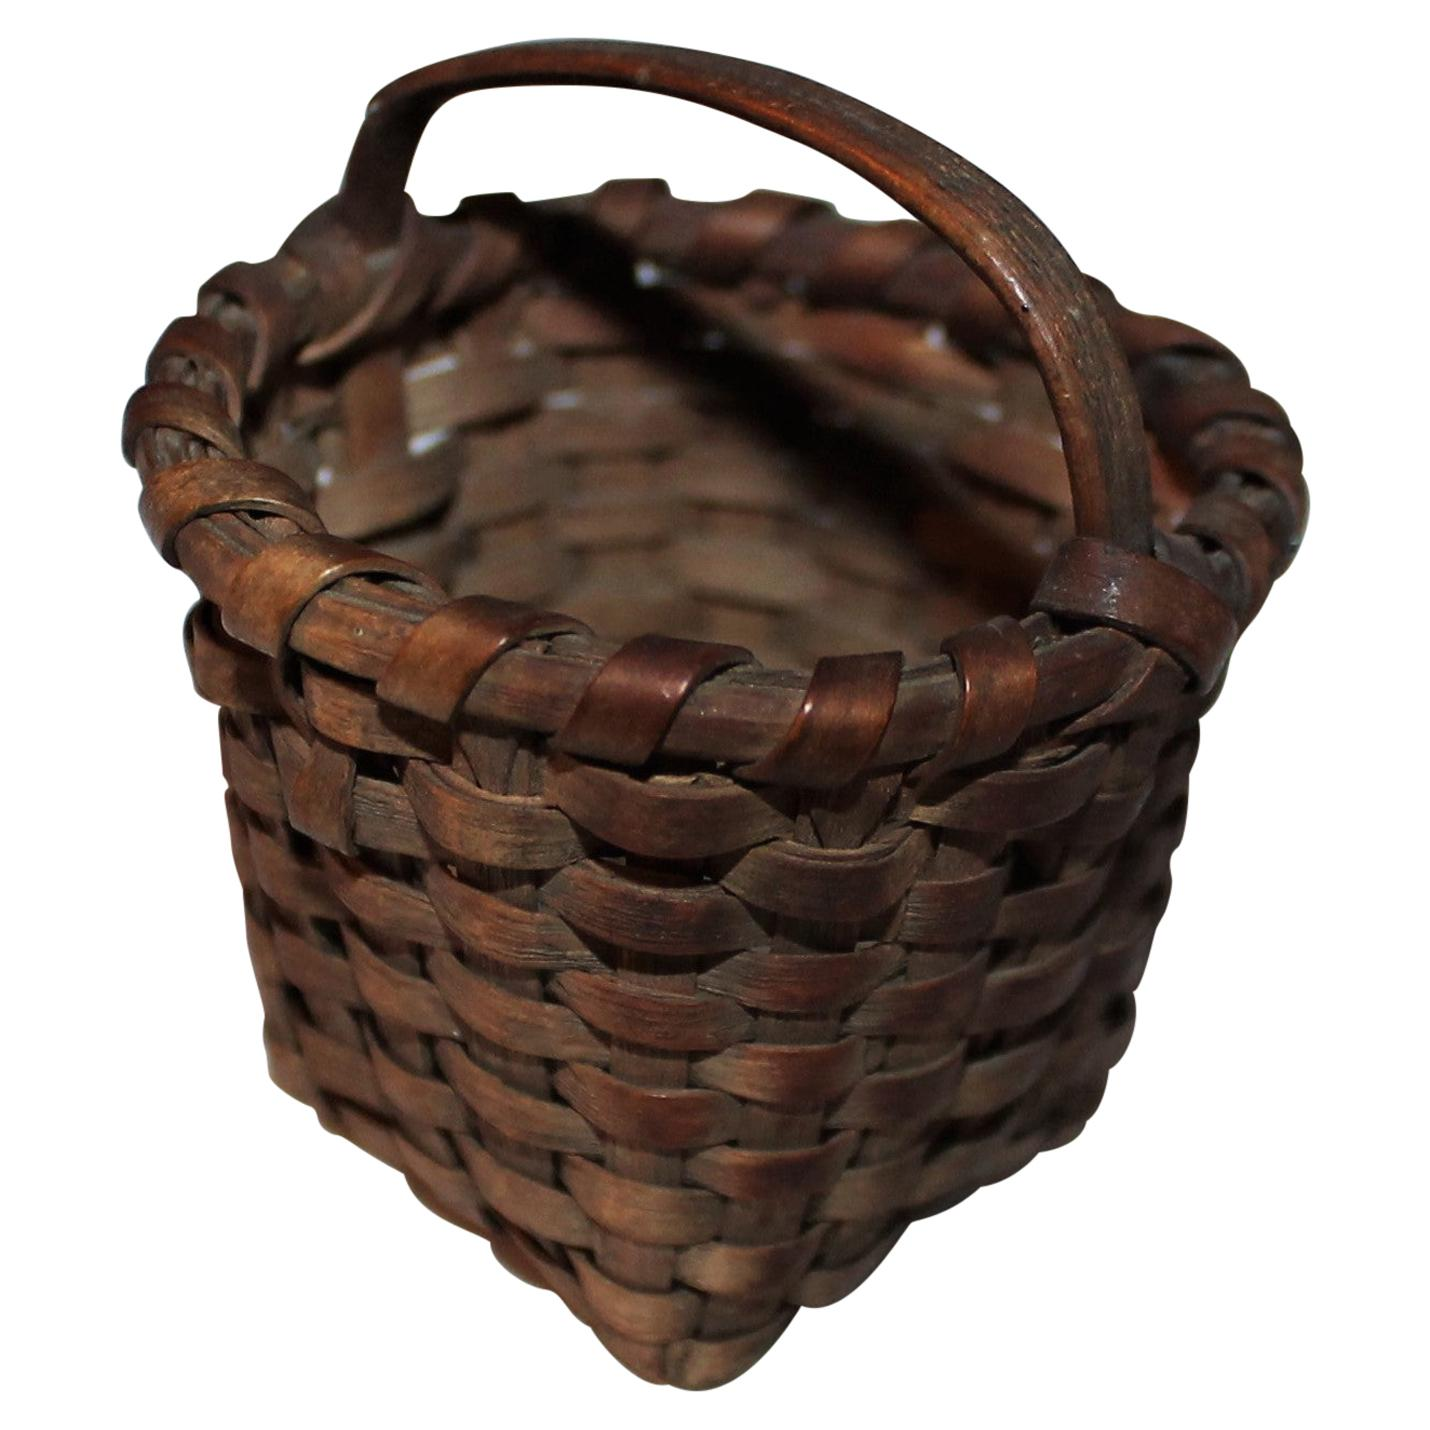 19th Century Miniature Basket with Original Surface